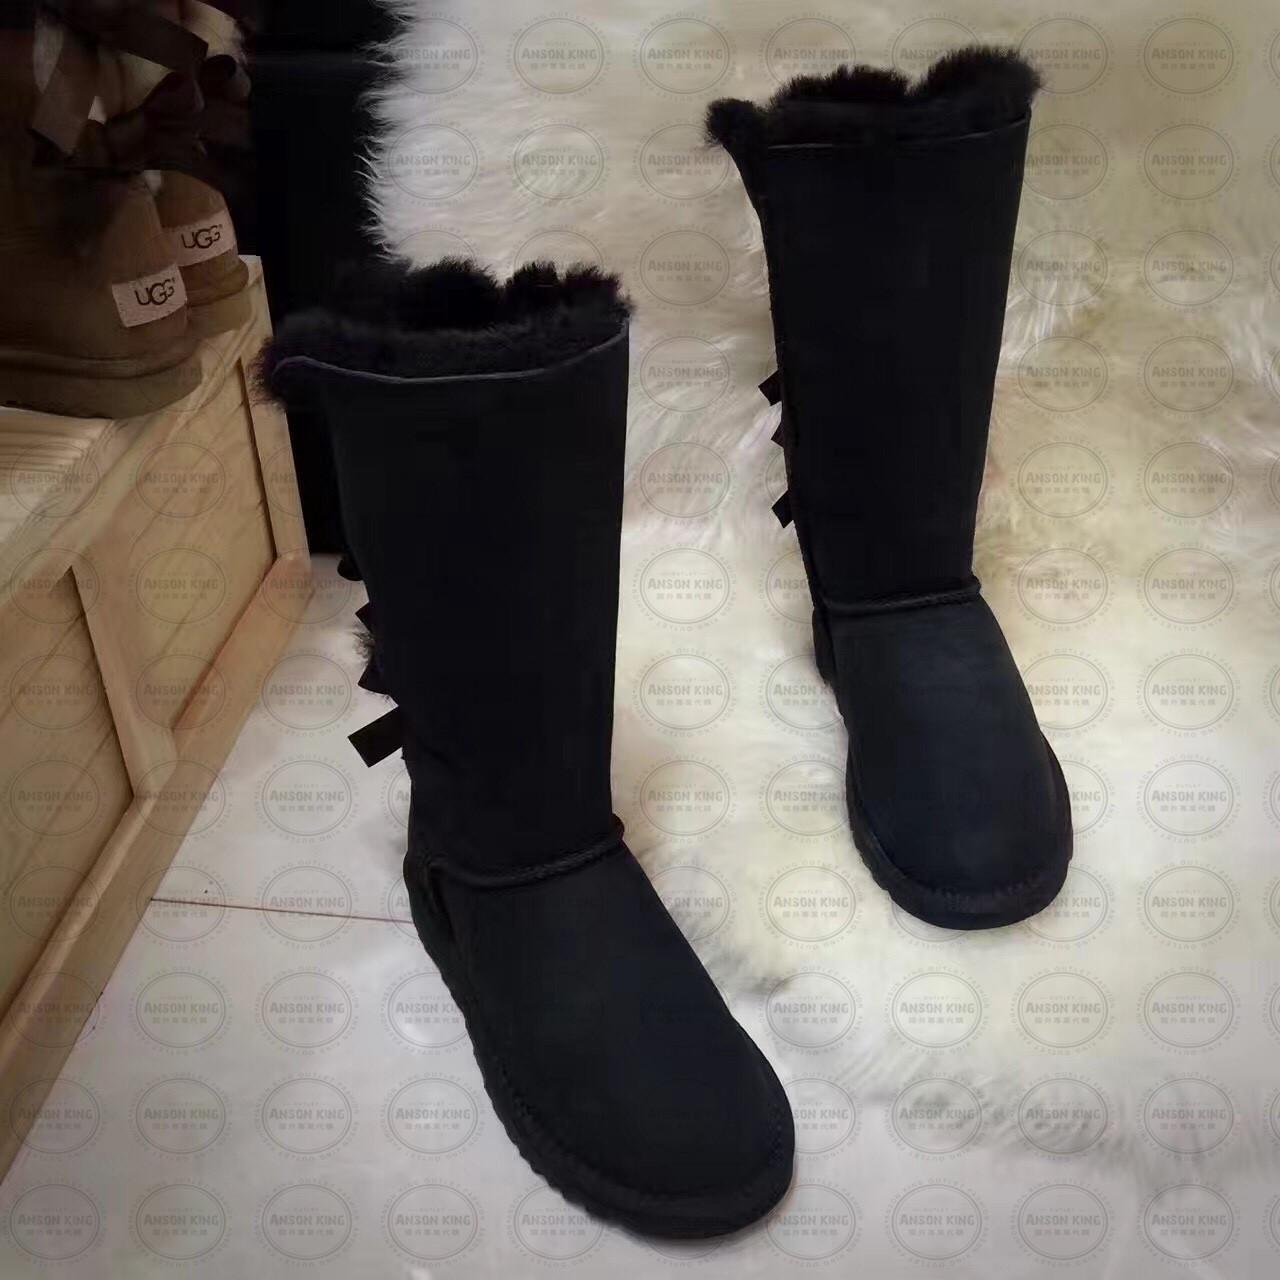 OUTLET正品代購 澳洲 UGG 一體女式絲帶蝴蝶結 保暖 真皮羊皮毛 雪靴 短靴 黑色